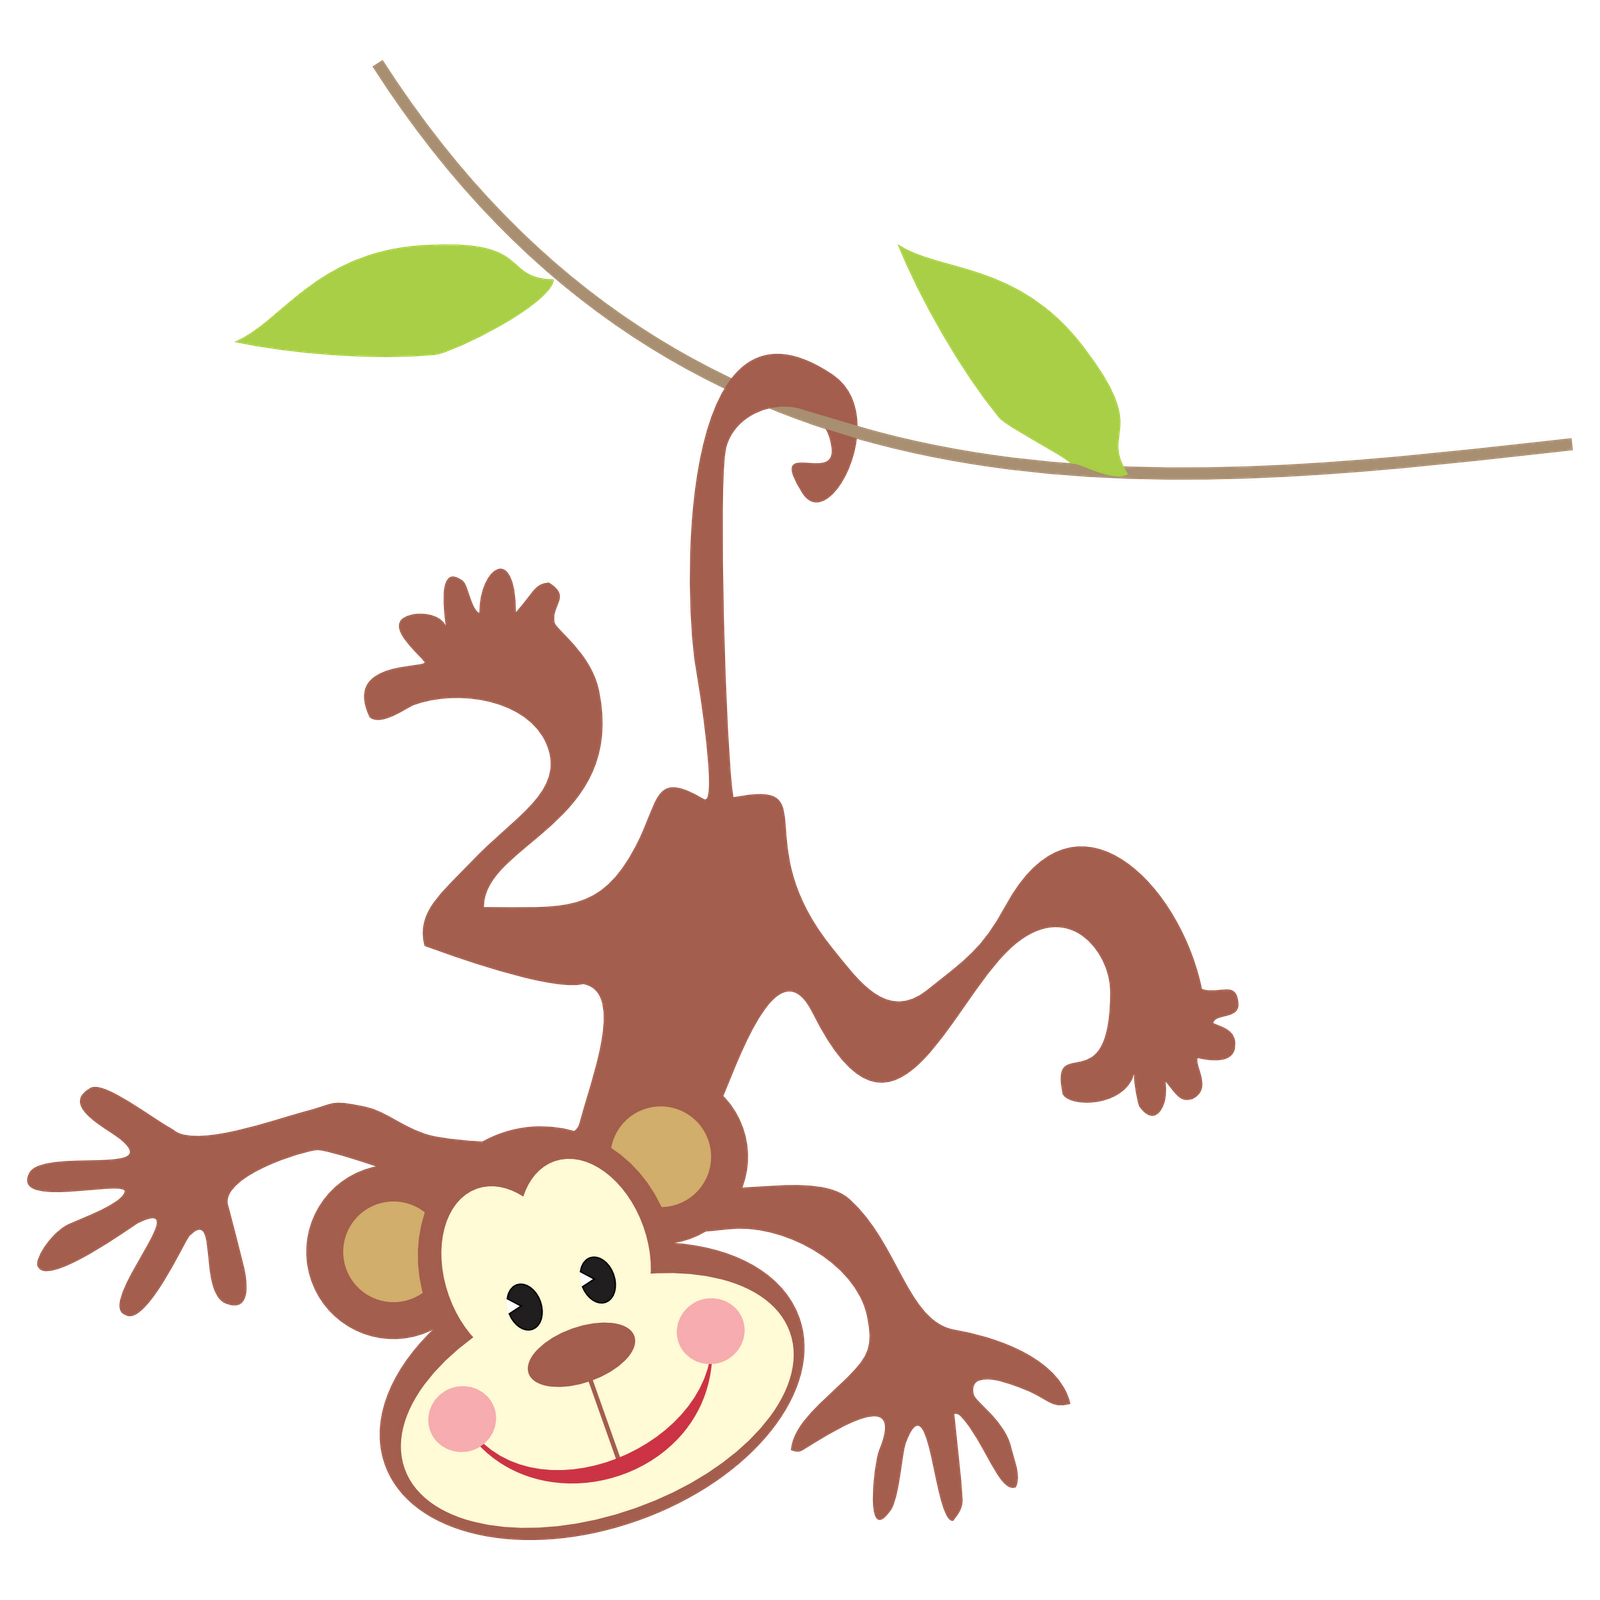 Baboon clipart teacher Monkey Baby monkey Clipart Pirate